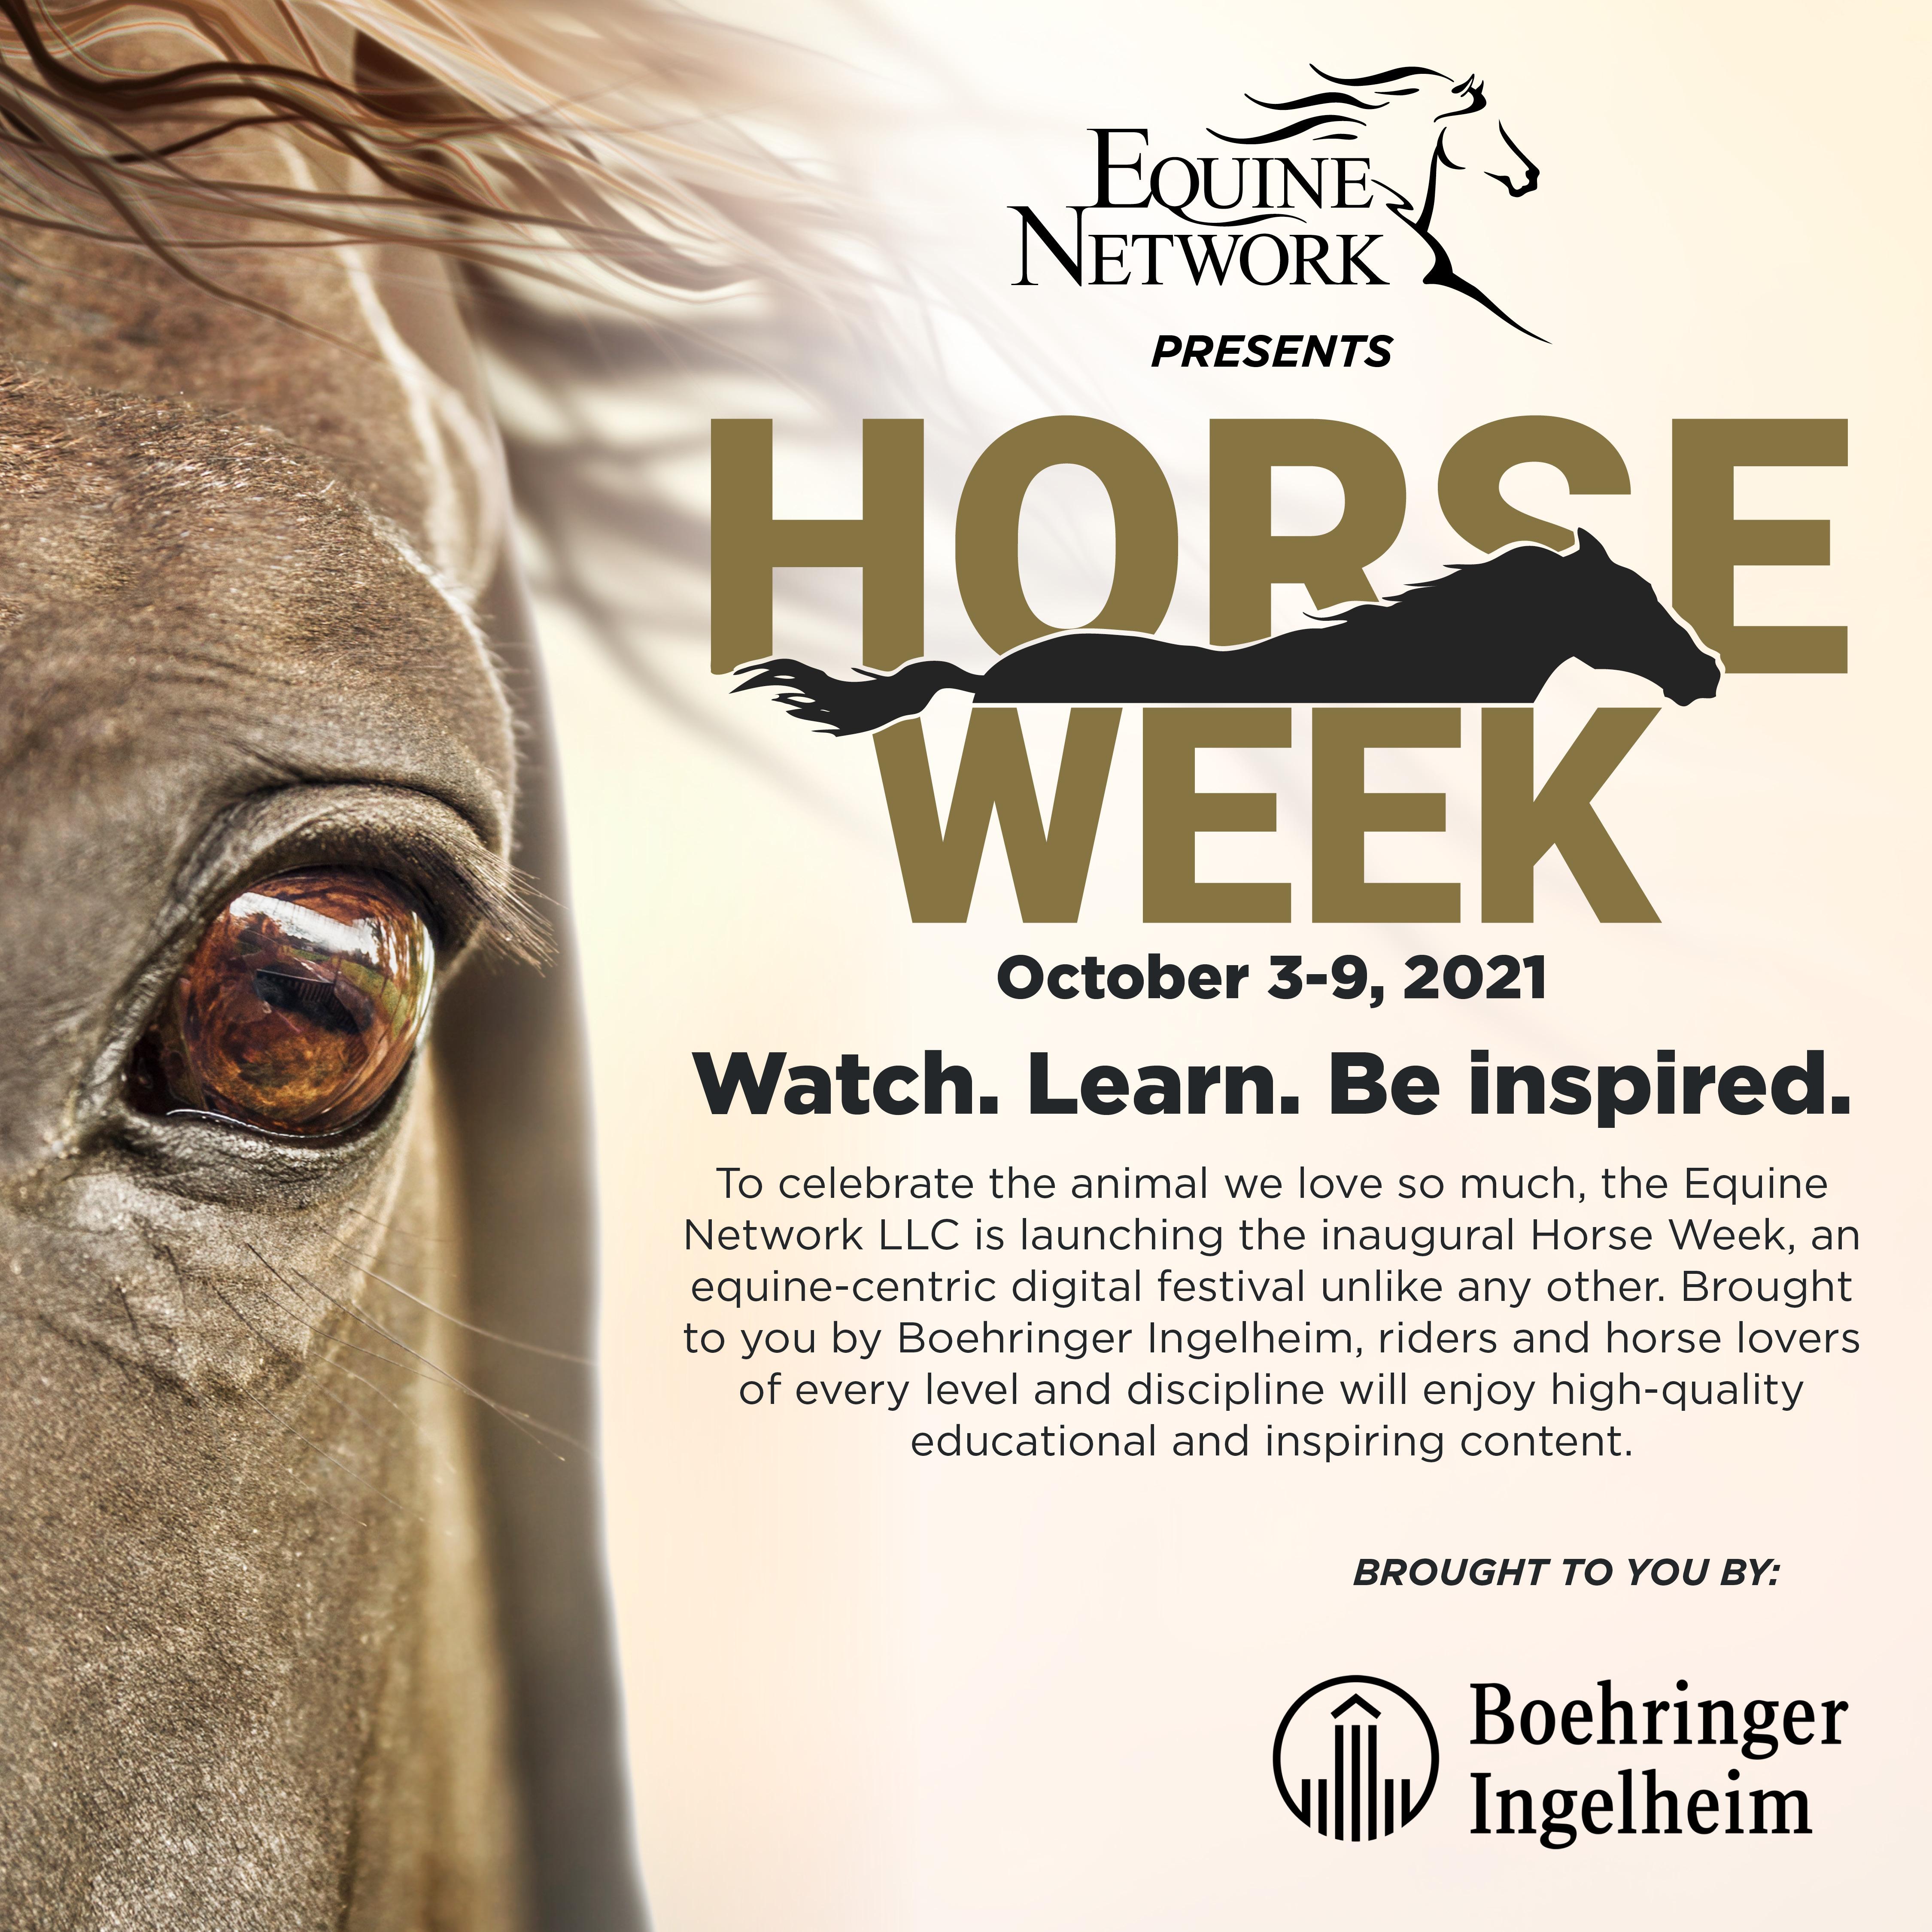 Horse Week